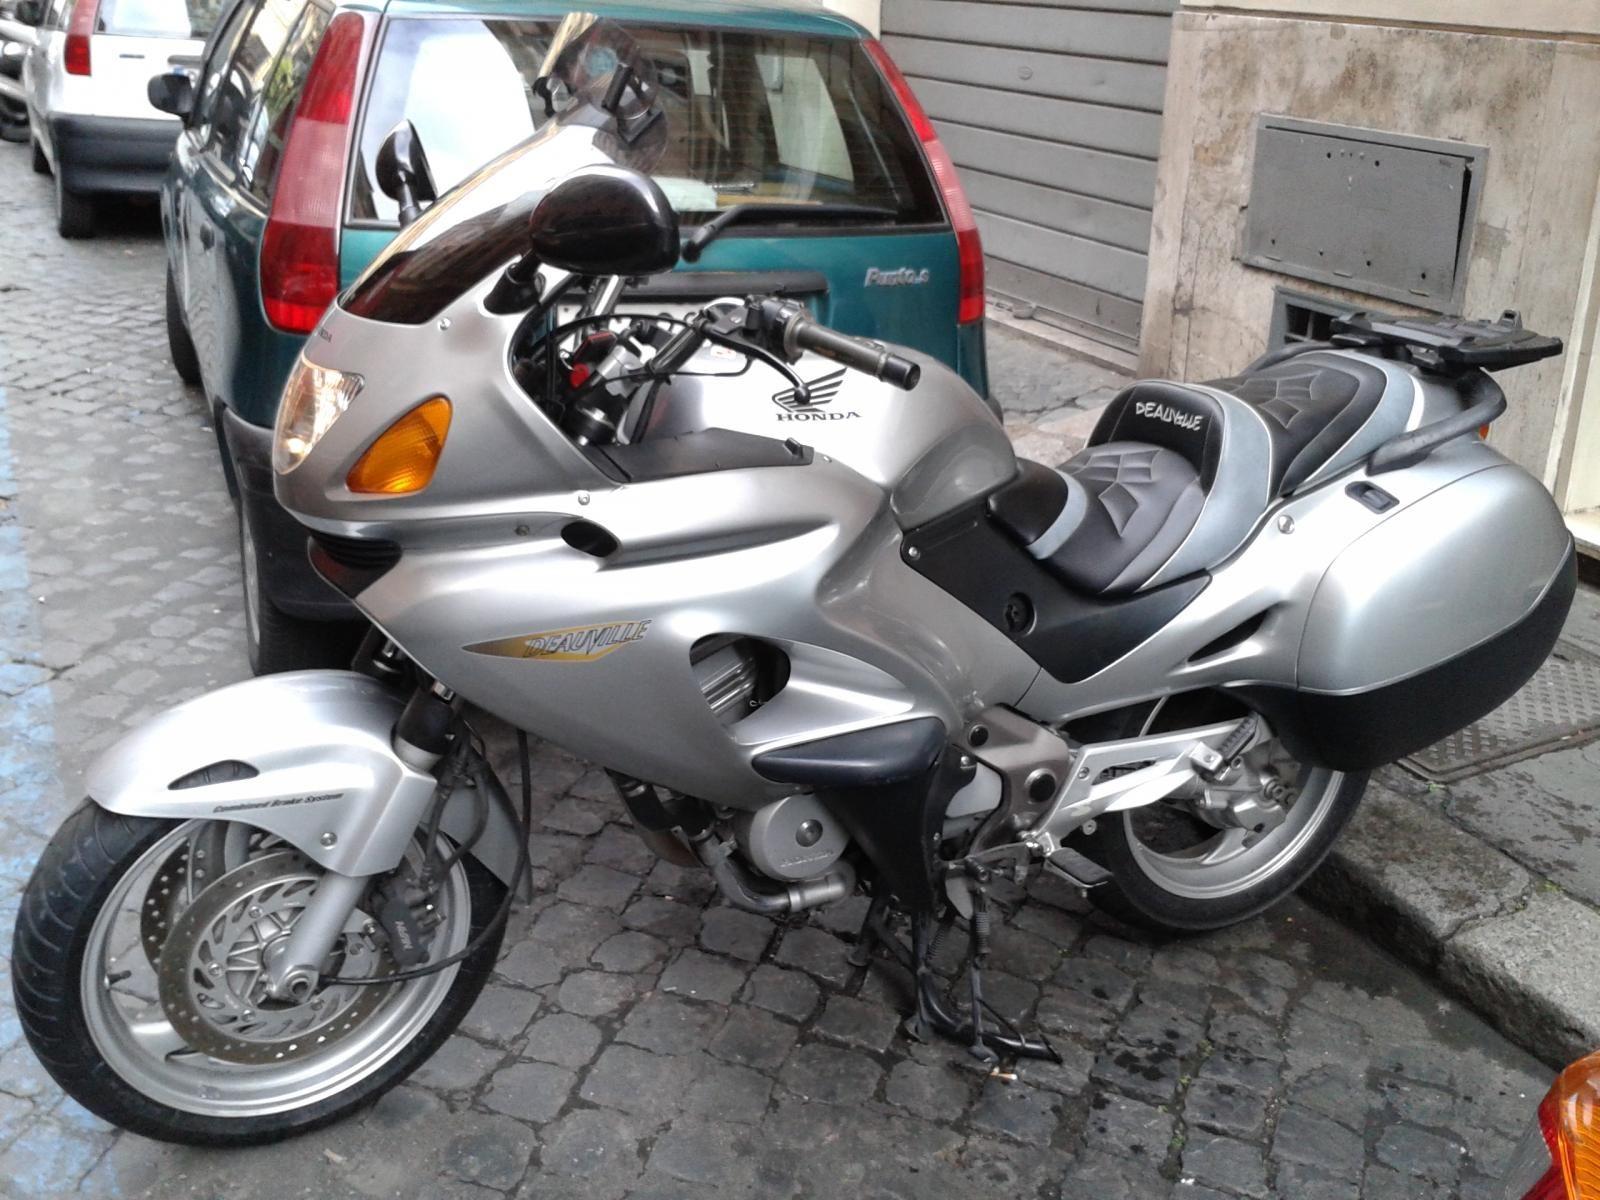 Honda deauville roma rm moto usate roma annunci for Moto usate in regalo